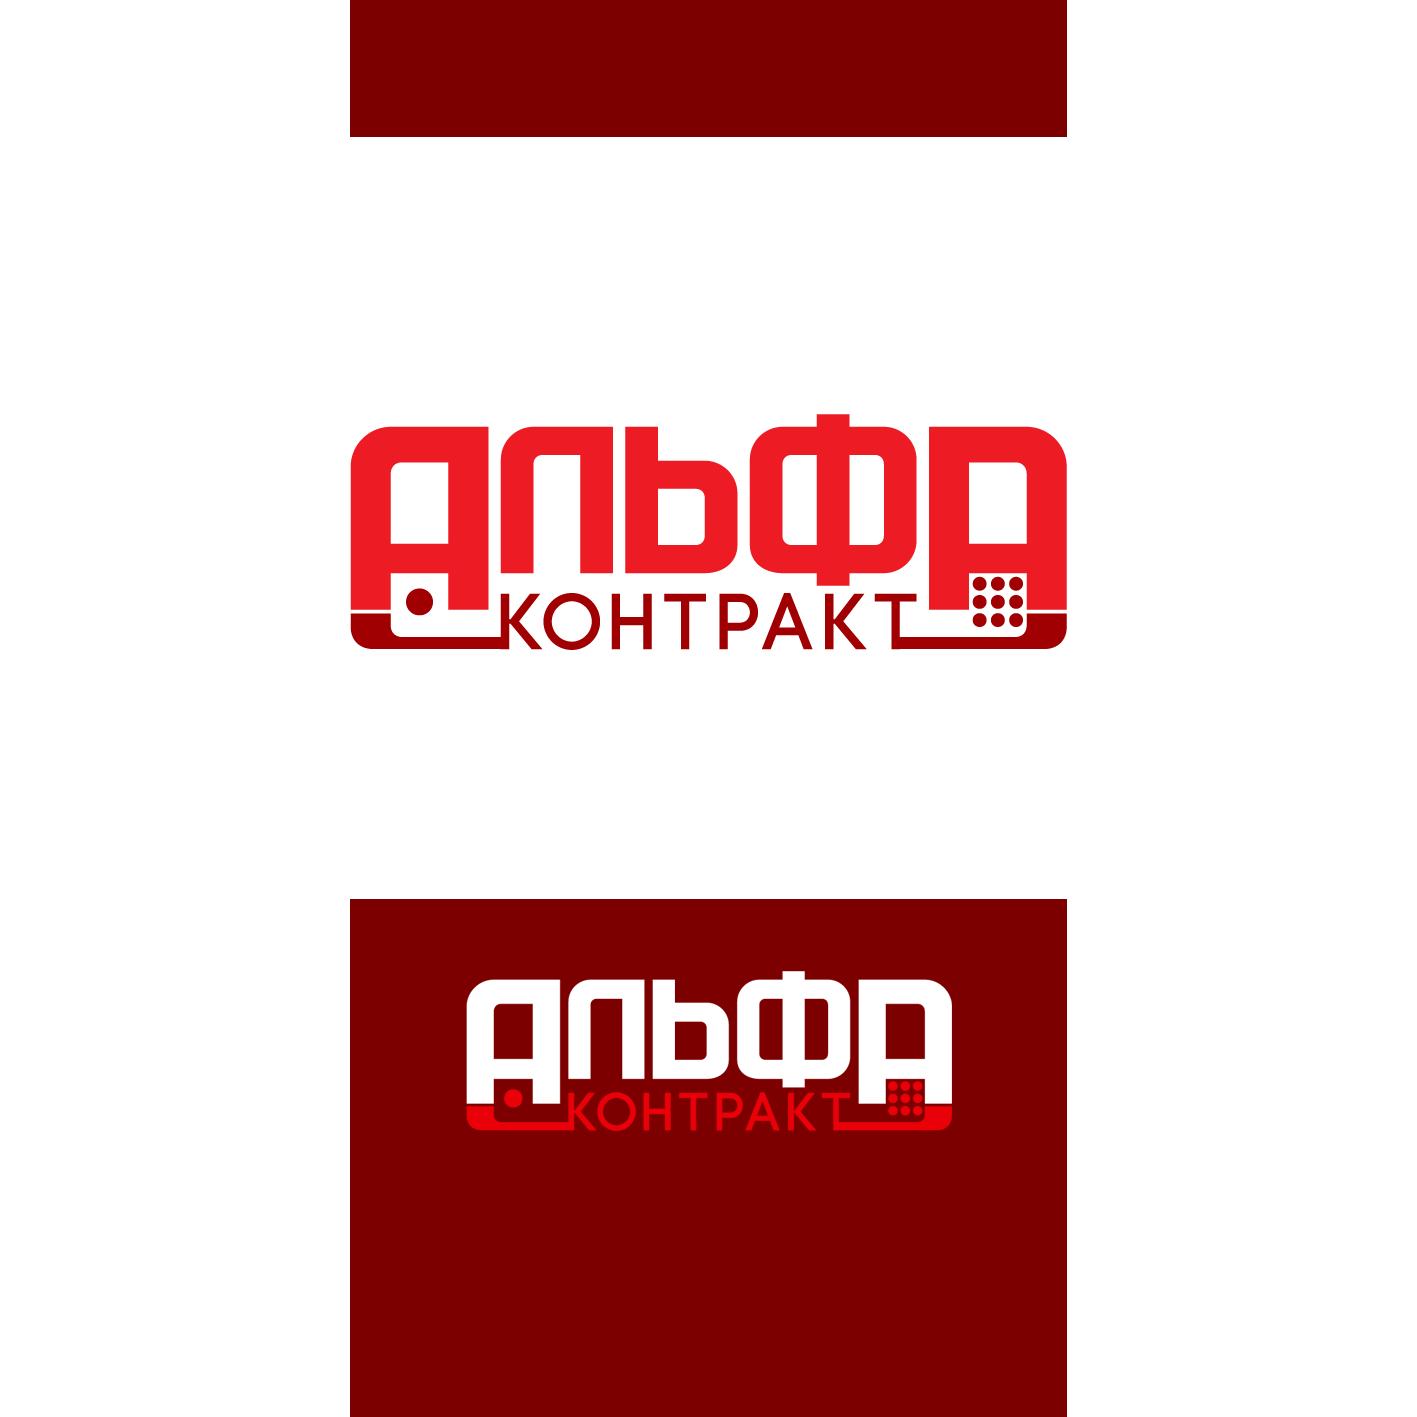 Дизайнер для разработки логотипа компании фото f_6675bf902ccc6f54.png